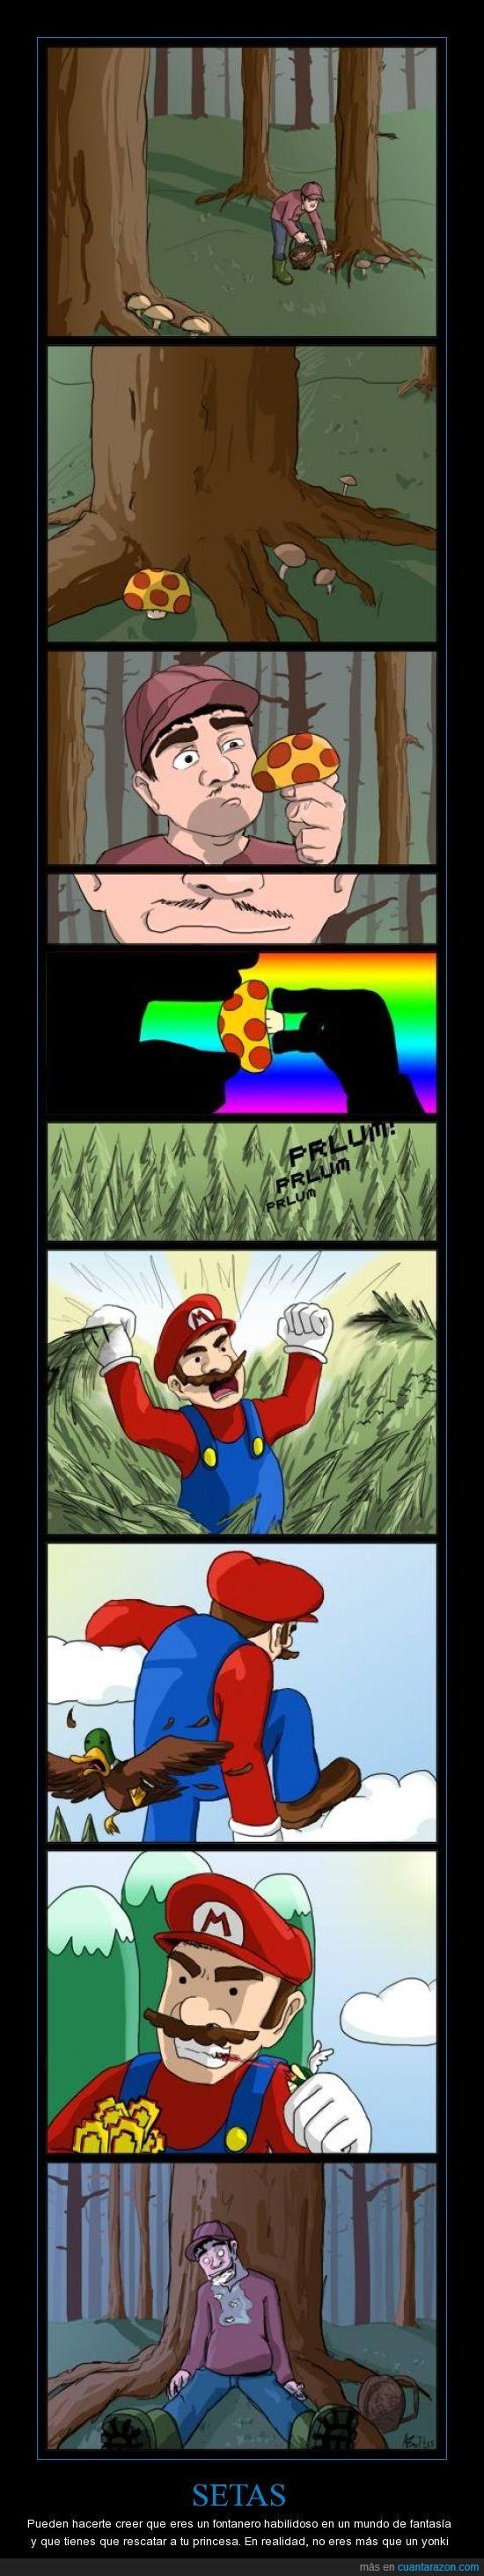 fontanero,Mario,no,setas